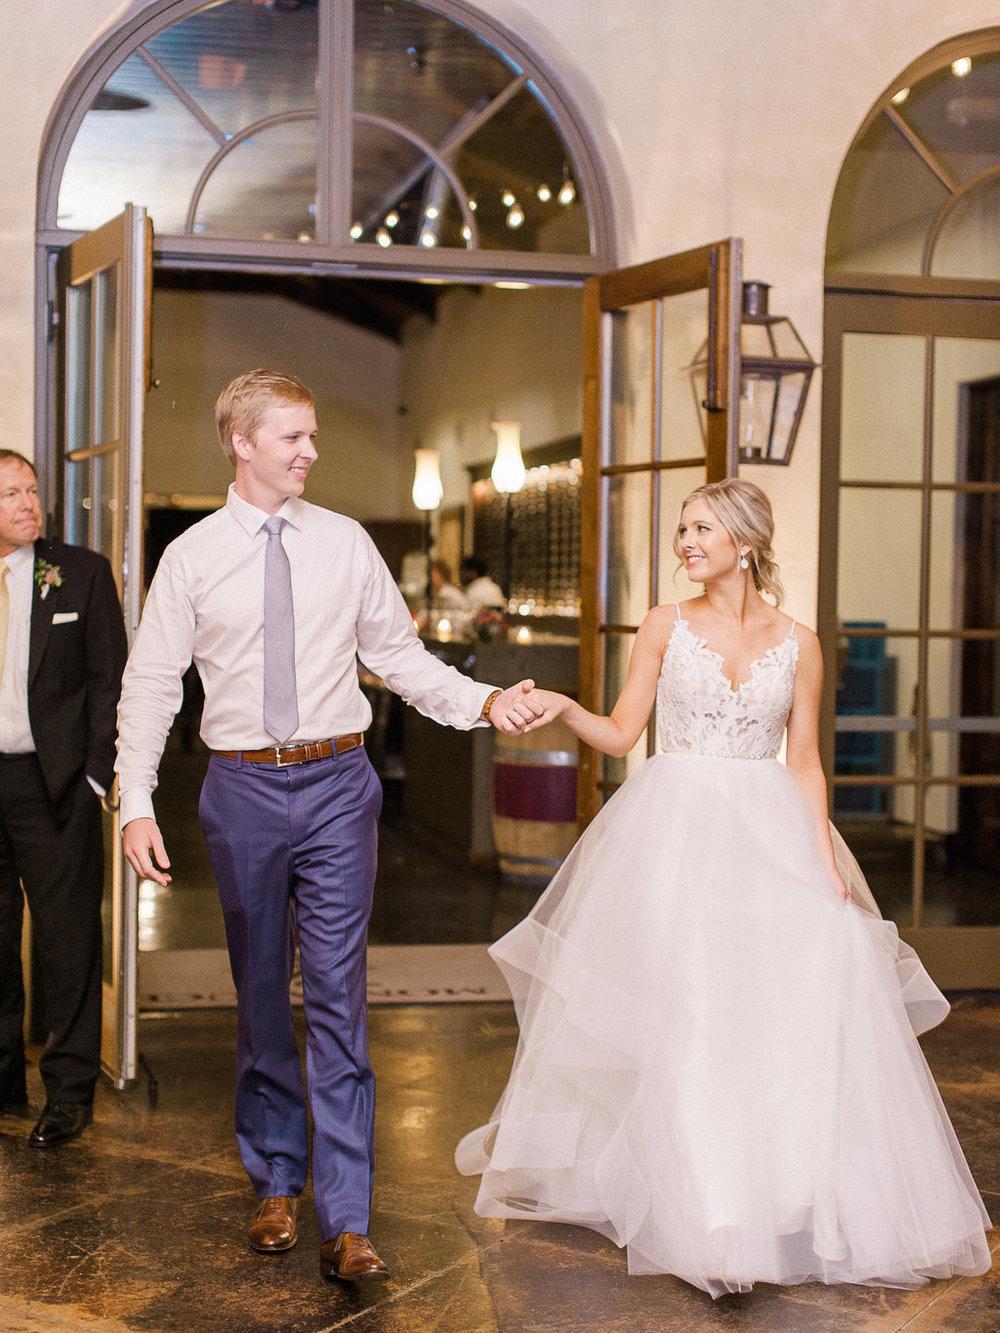 montaluce-winery-dahlonega-atlanta-wedding-photographer-fine-art-film-hannah-forsberg69.JPG